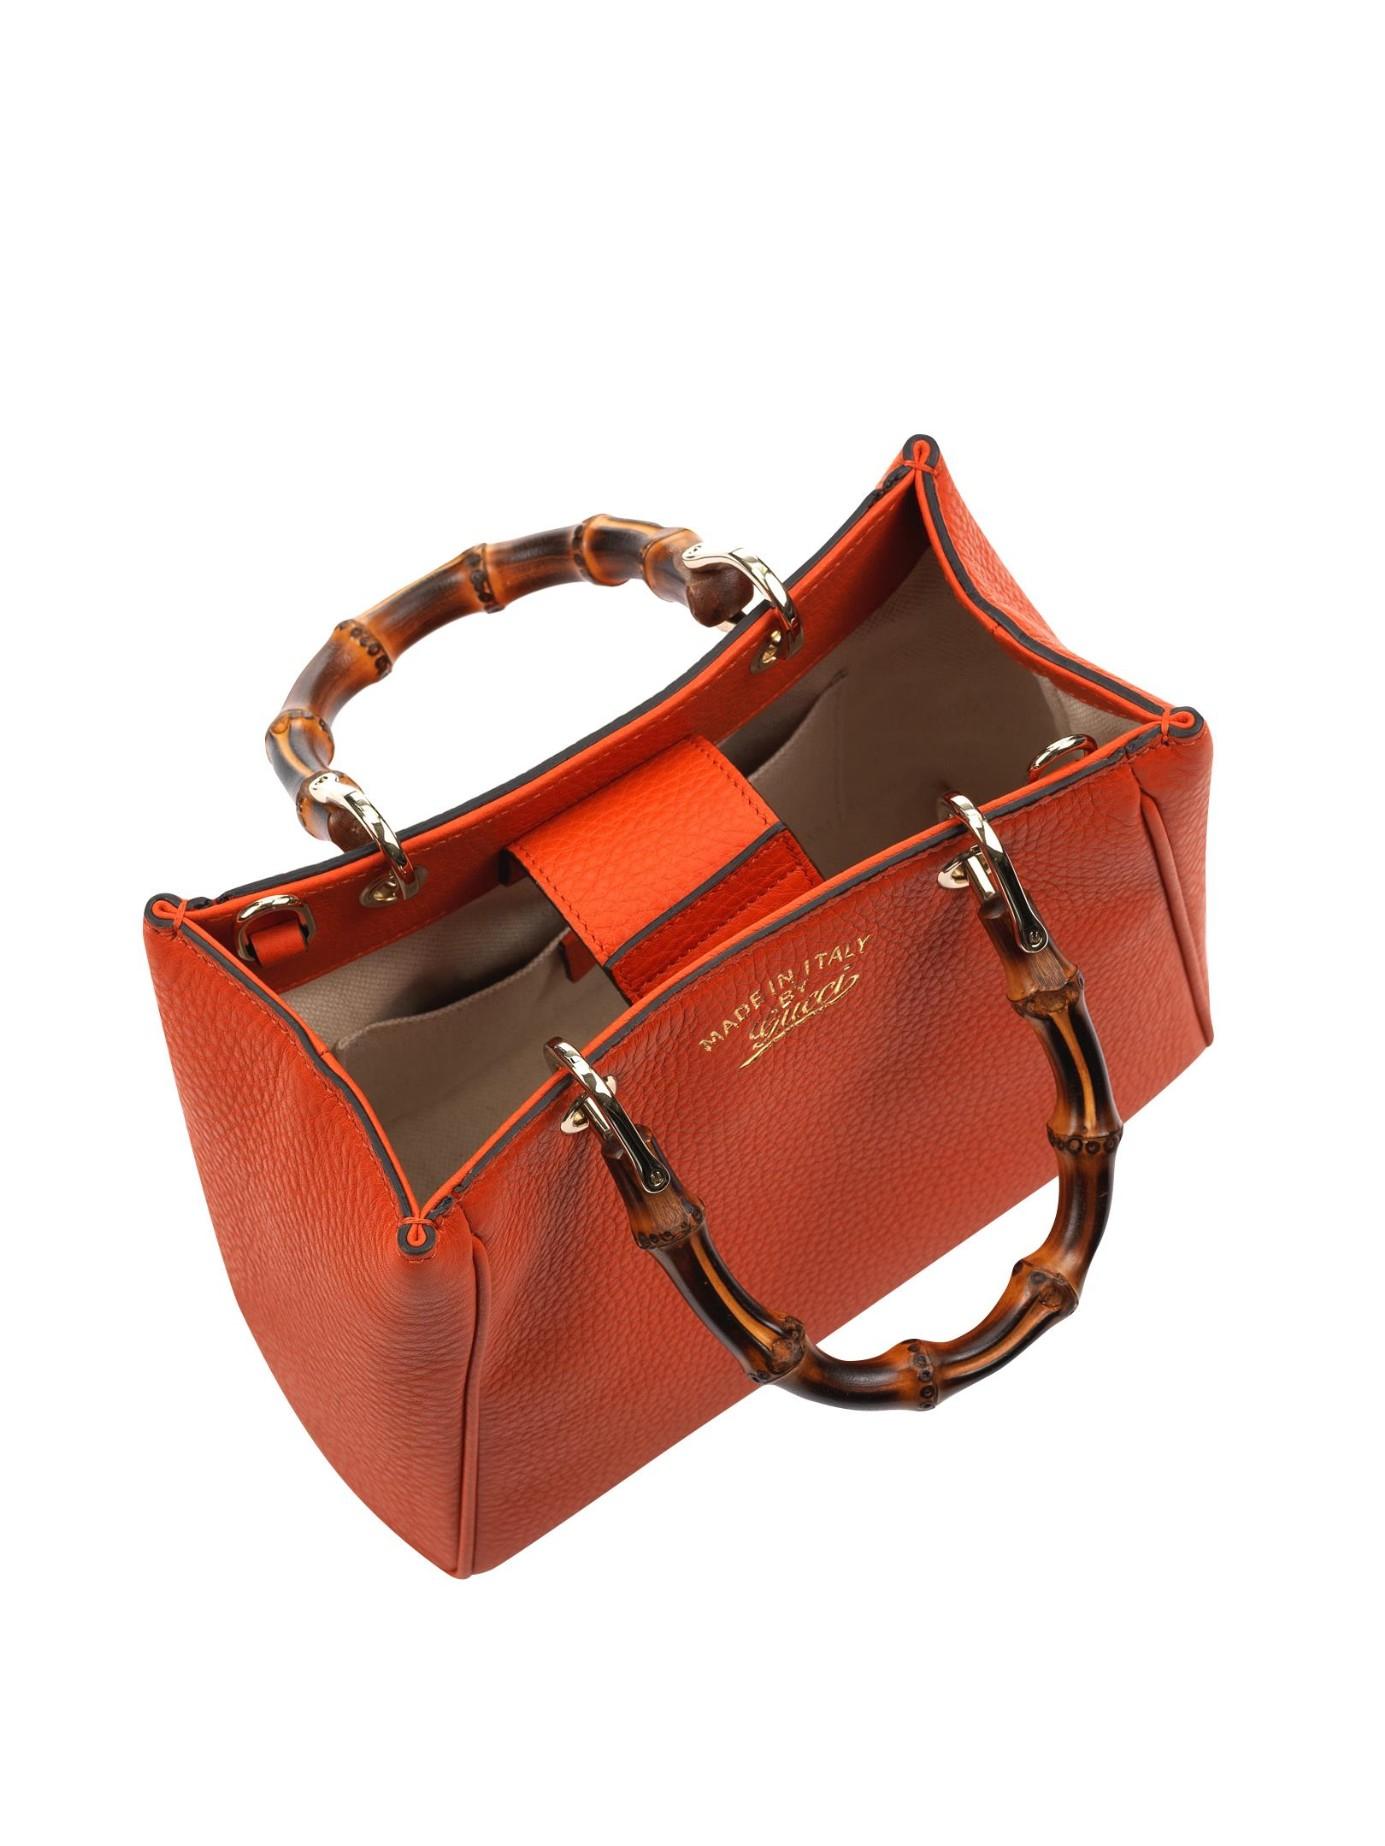 a0cd56e7a60 Lyst - Gucci Bamboo Mini Leather Cross-body Bag in Orange